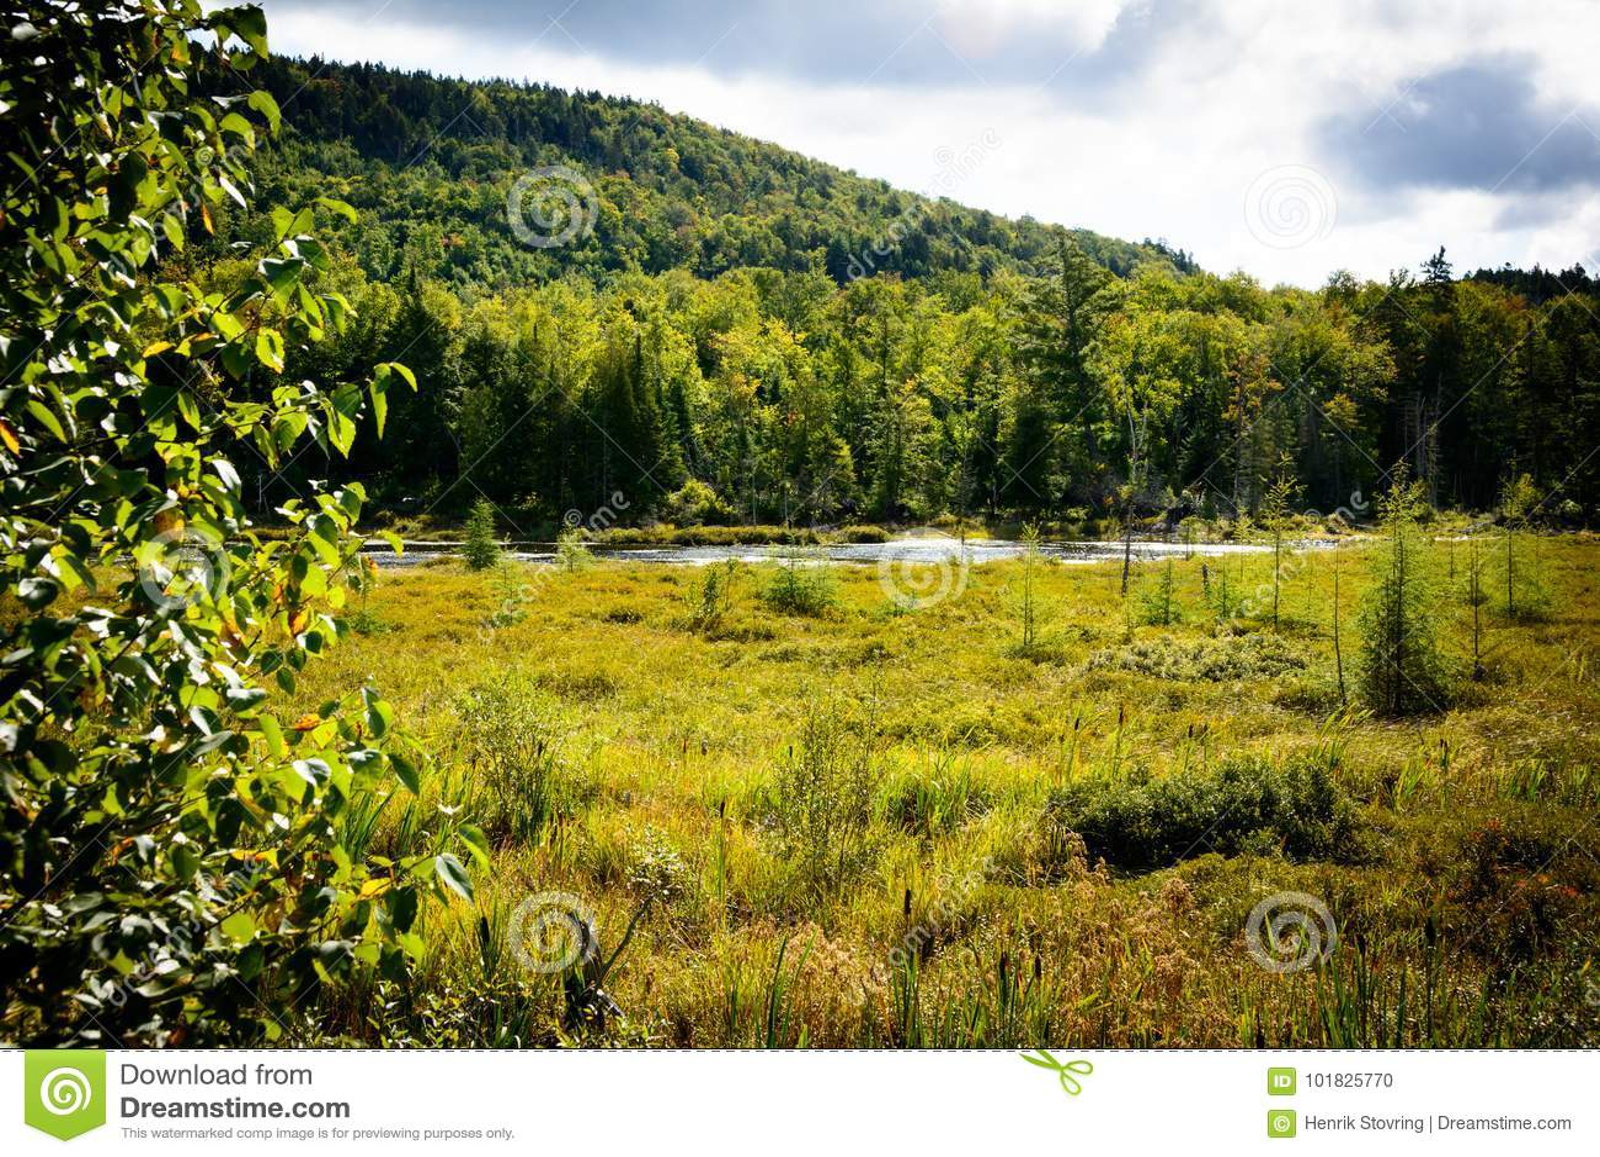 Mont-Tremblant nationalpark, Kanada - landskap med sjön